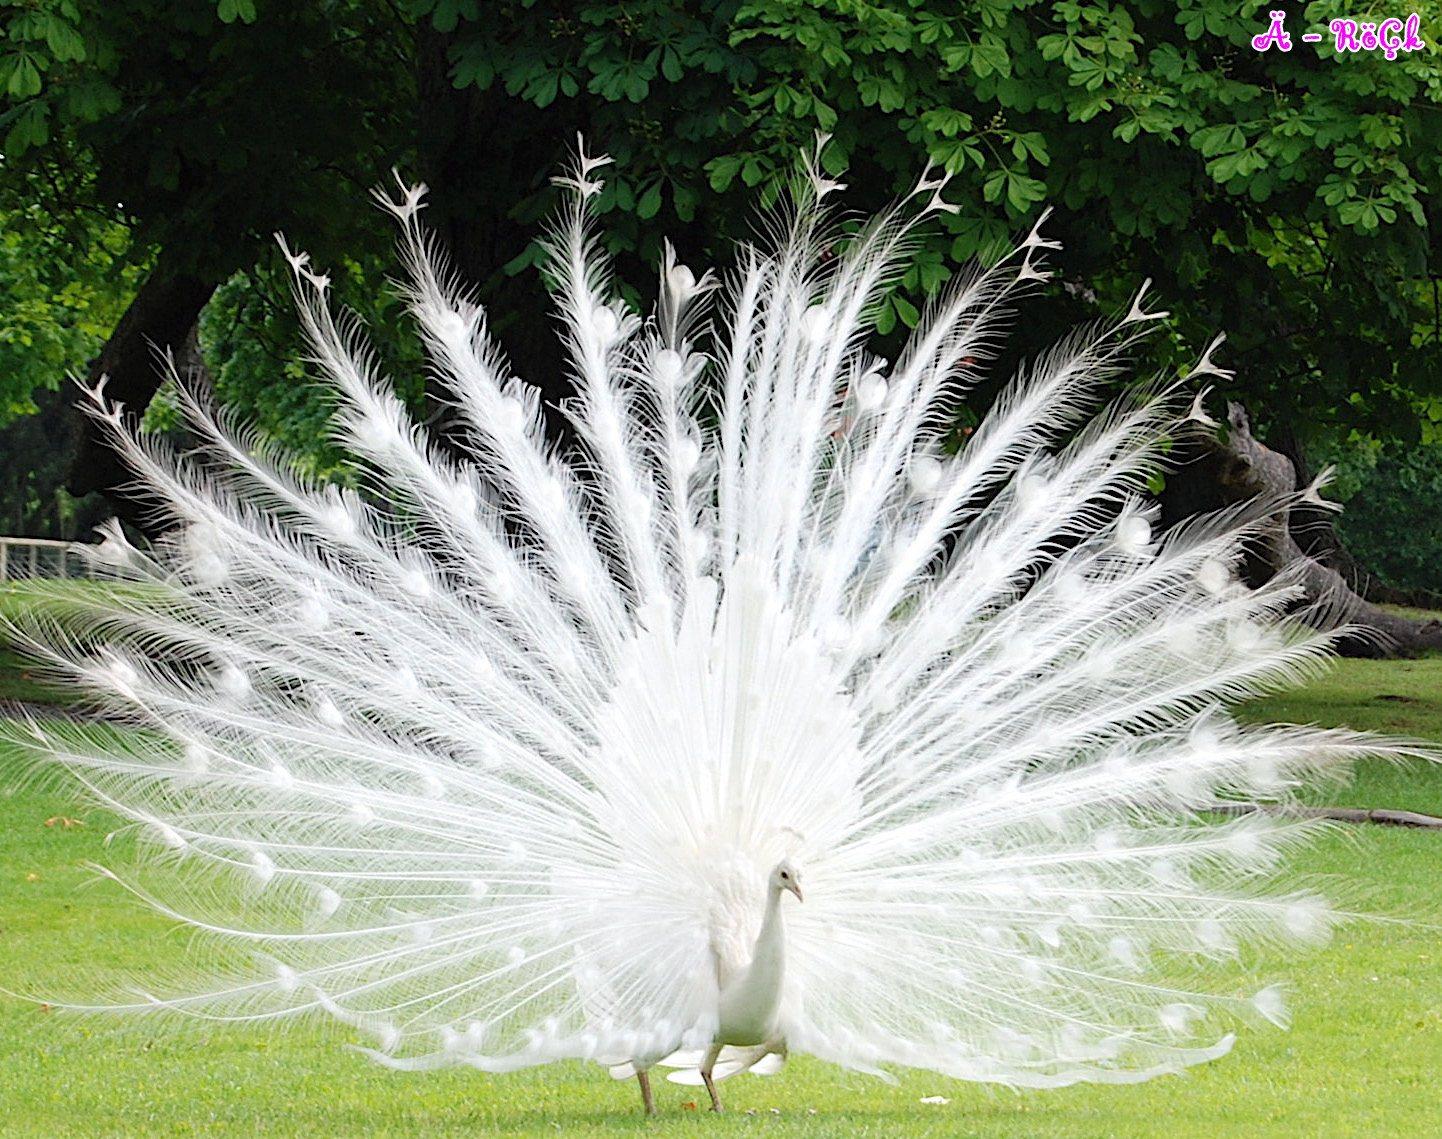 http://1.bp.blogspot.com/-iWVSs2rBi6A/TbTtINiRbRI/AAAAAAAADOU/XSvsoAHzOCg/s1600/Peacock+%252896%2529.jpg